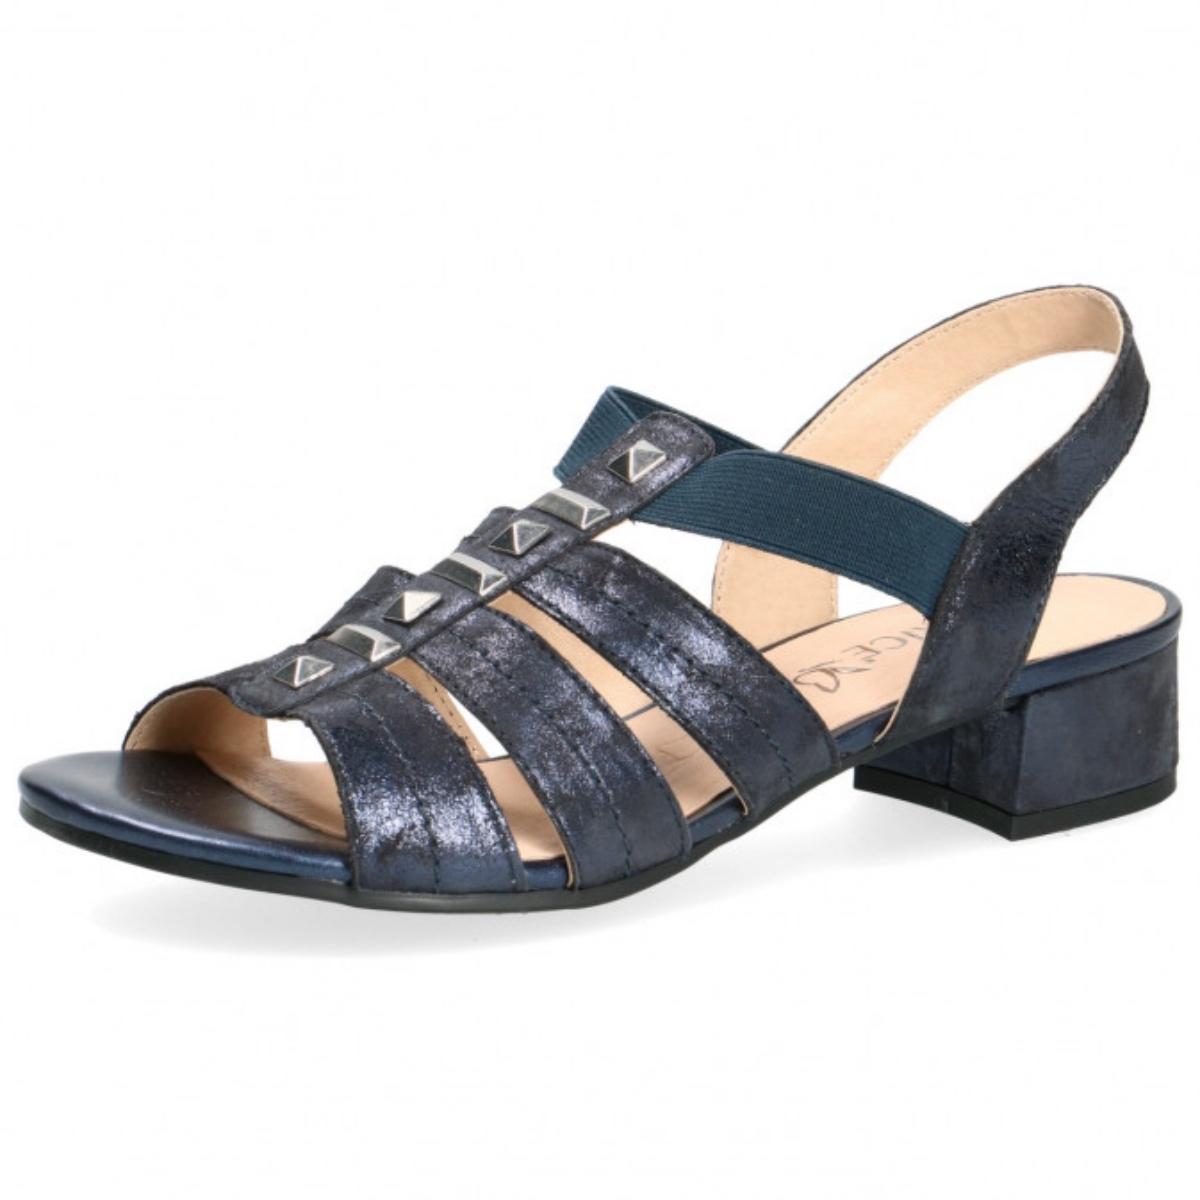 new product on feet images of release date Details zu CAPRICE Damen Riemchensandalen Sandalen Sandaletten 9-28204-22  Ocean Blau